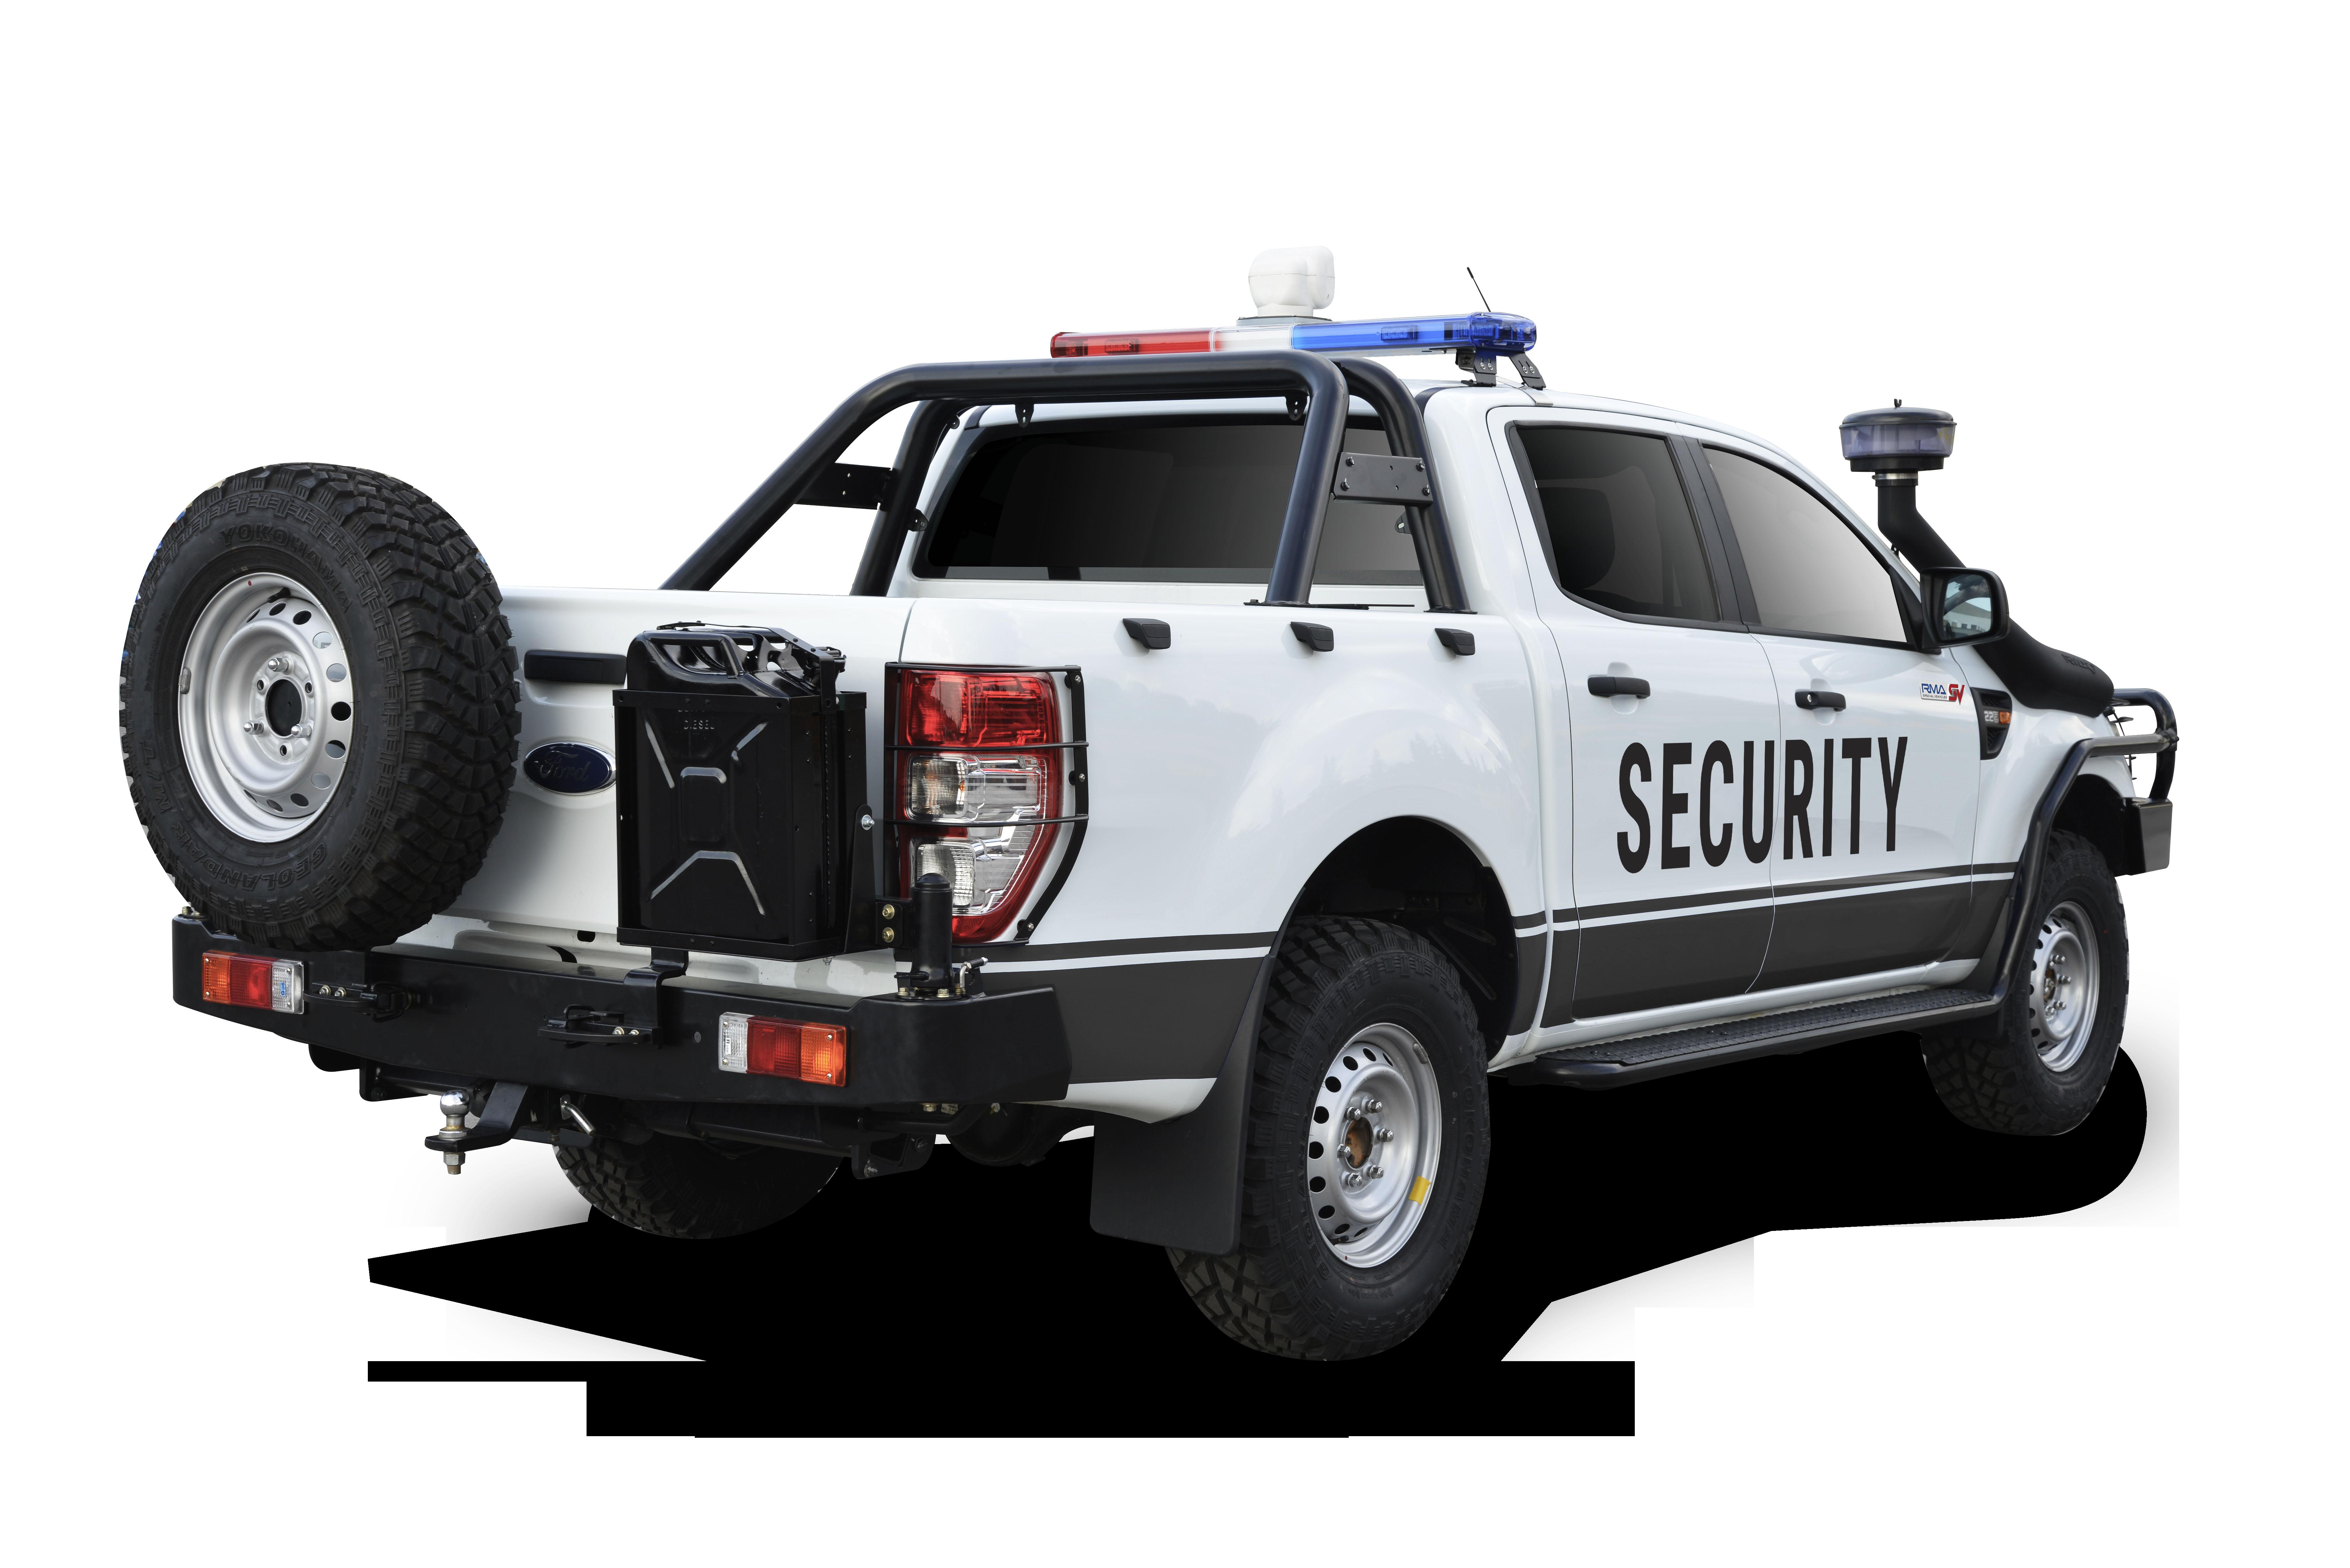 Security Rear